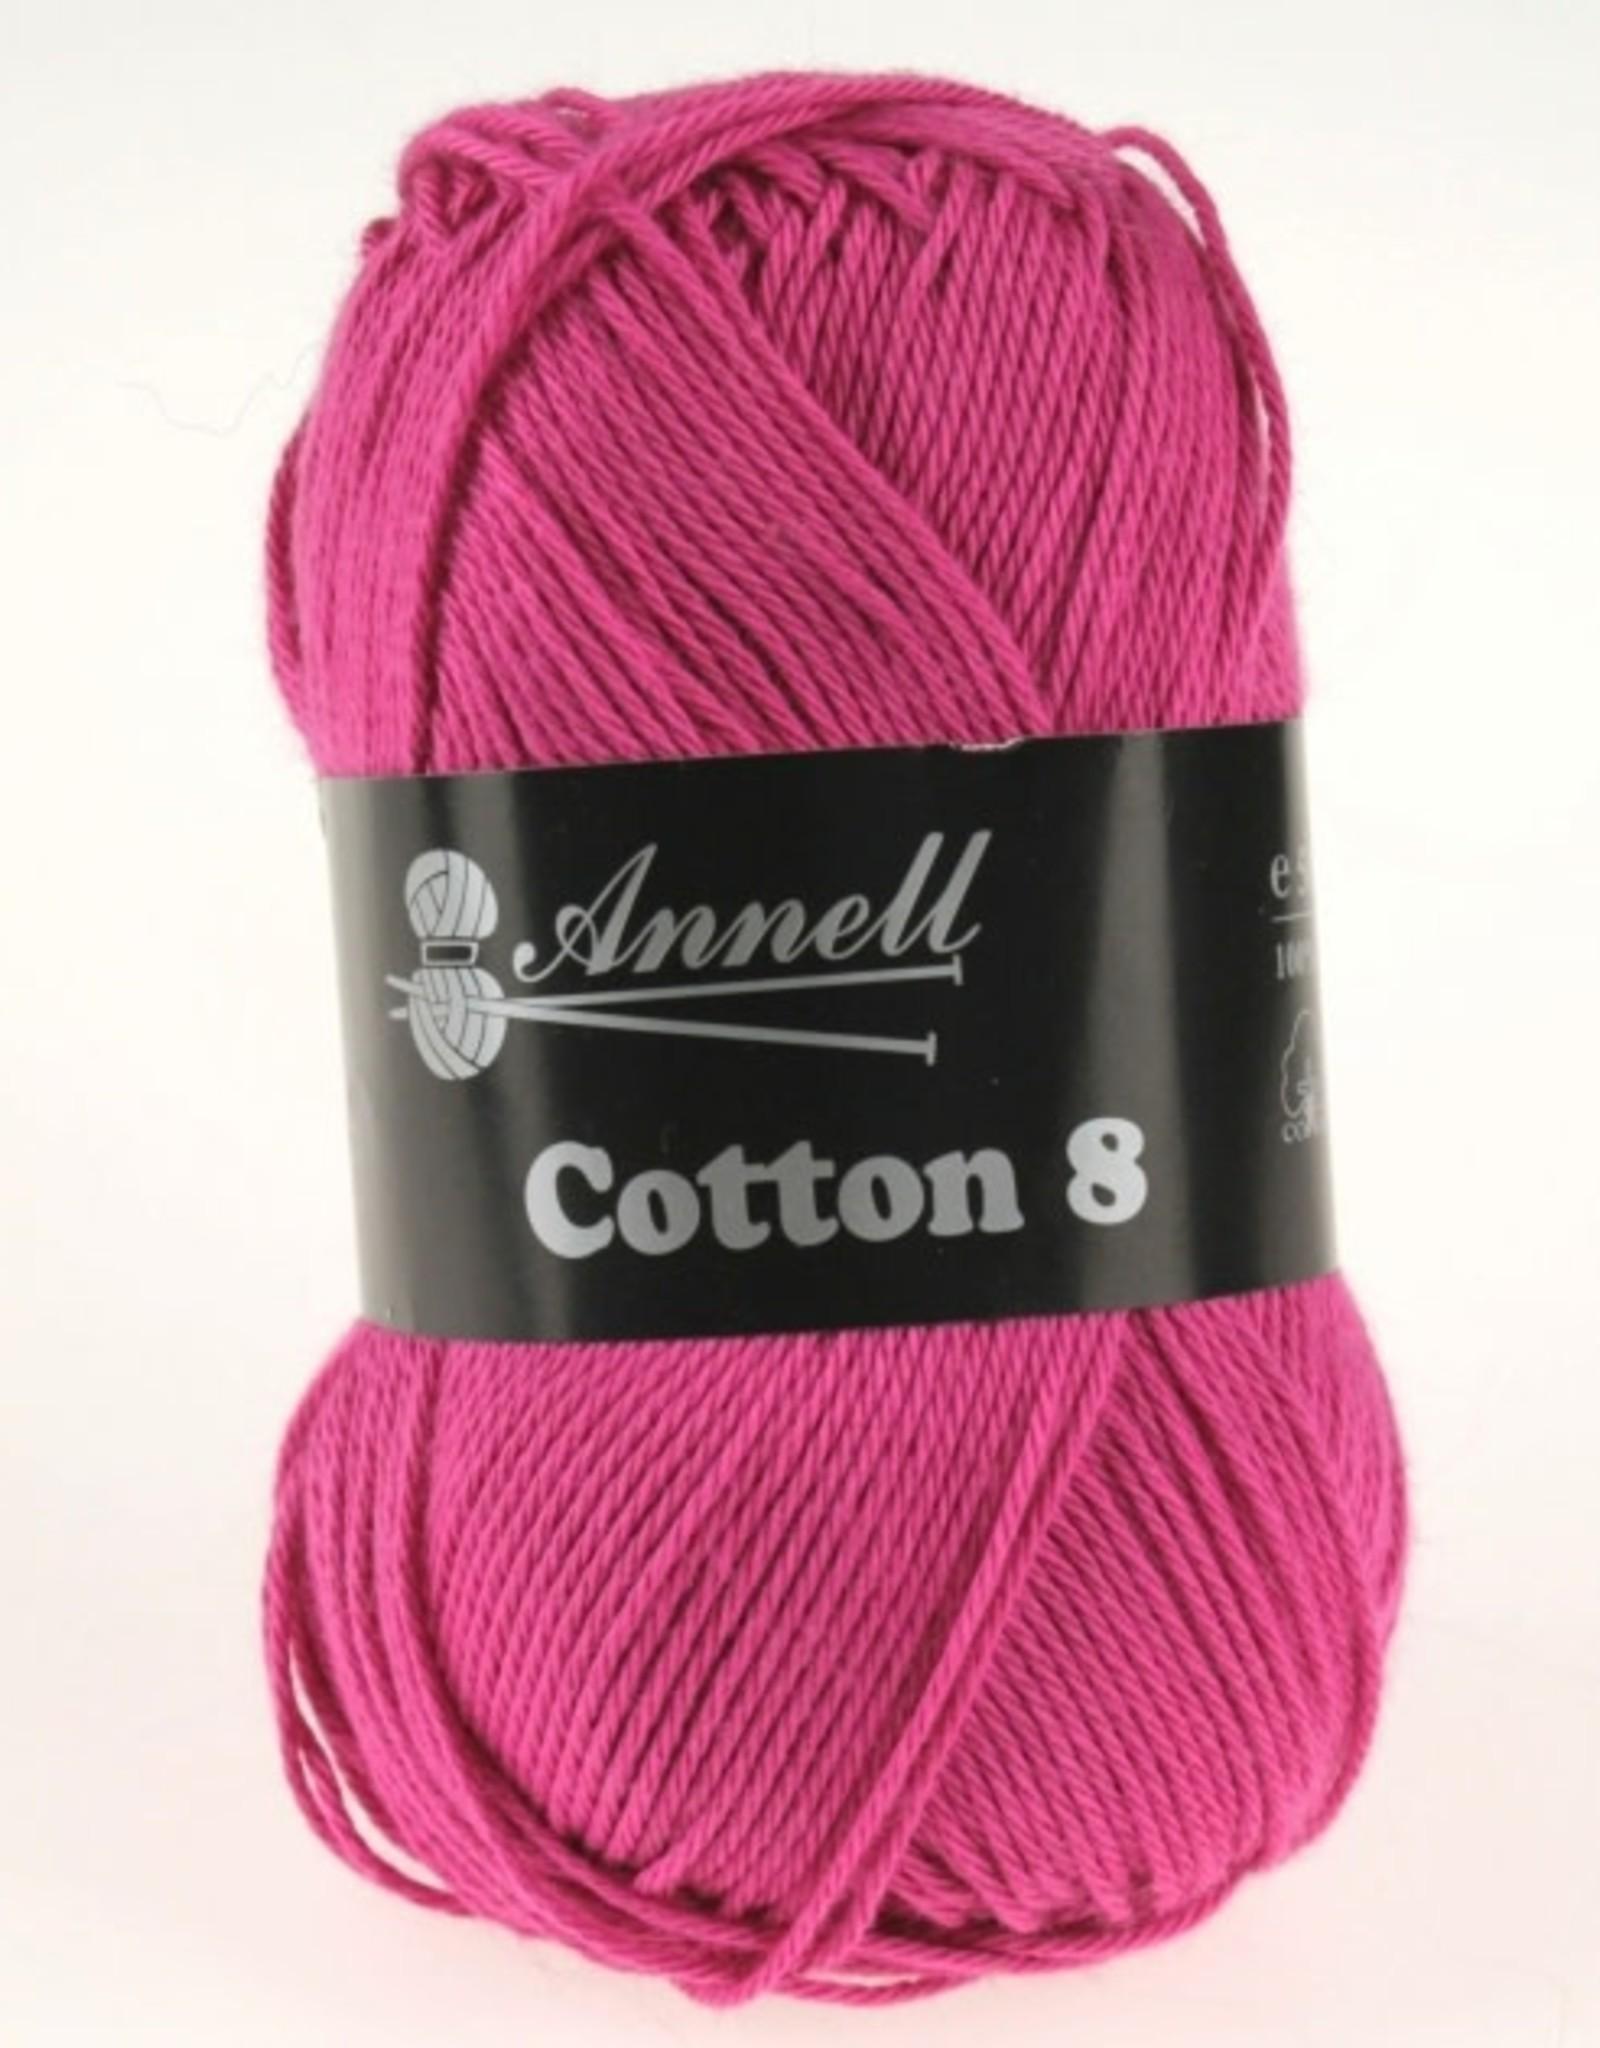 Annell Annell Cotton 8 52